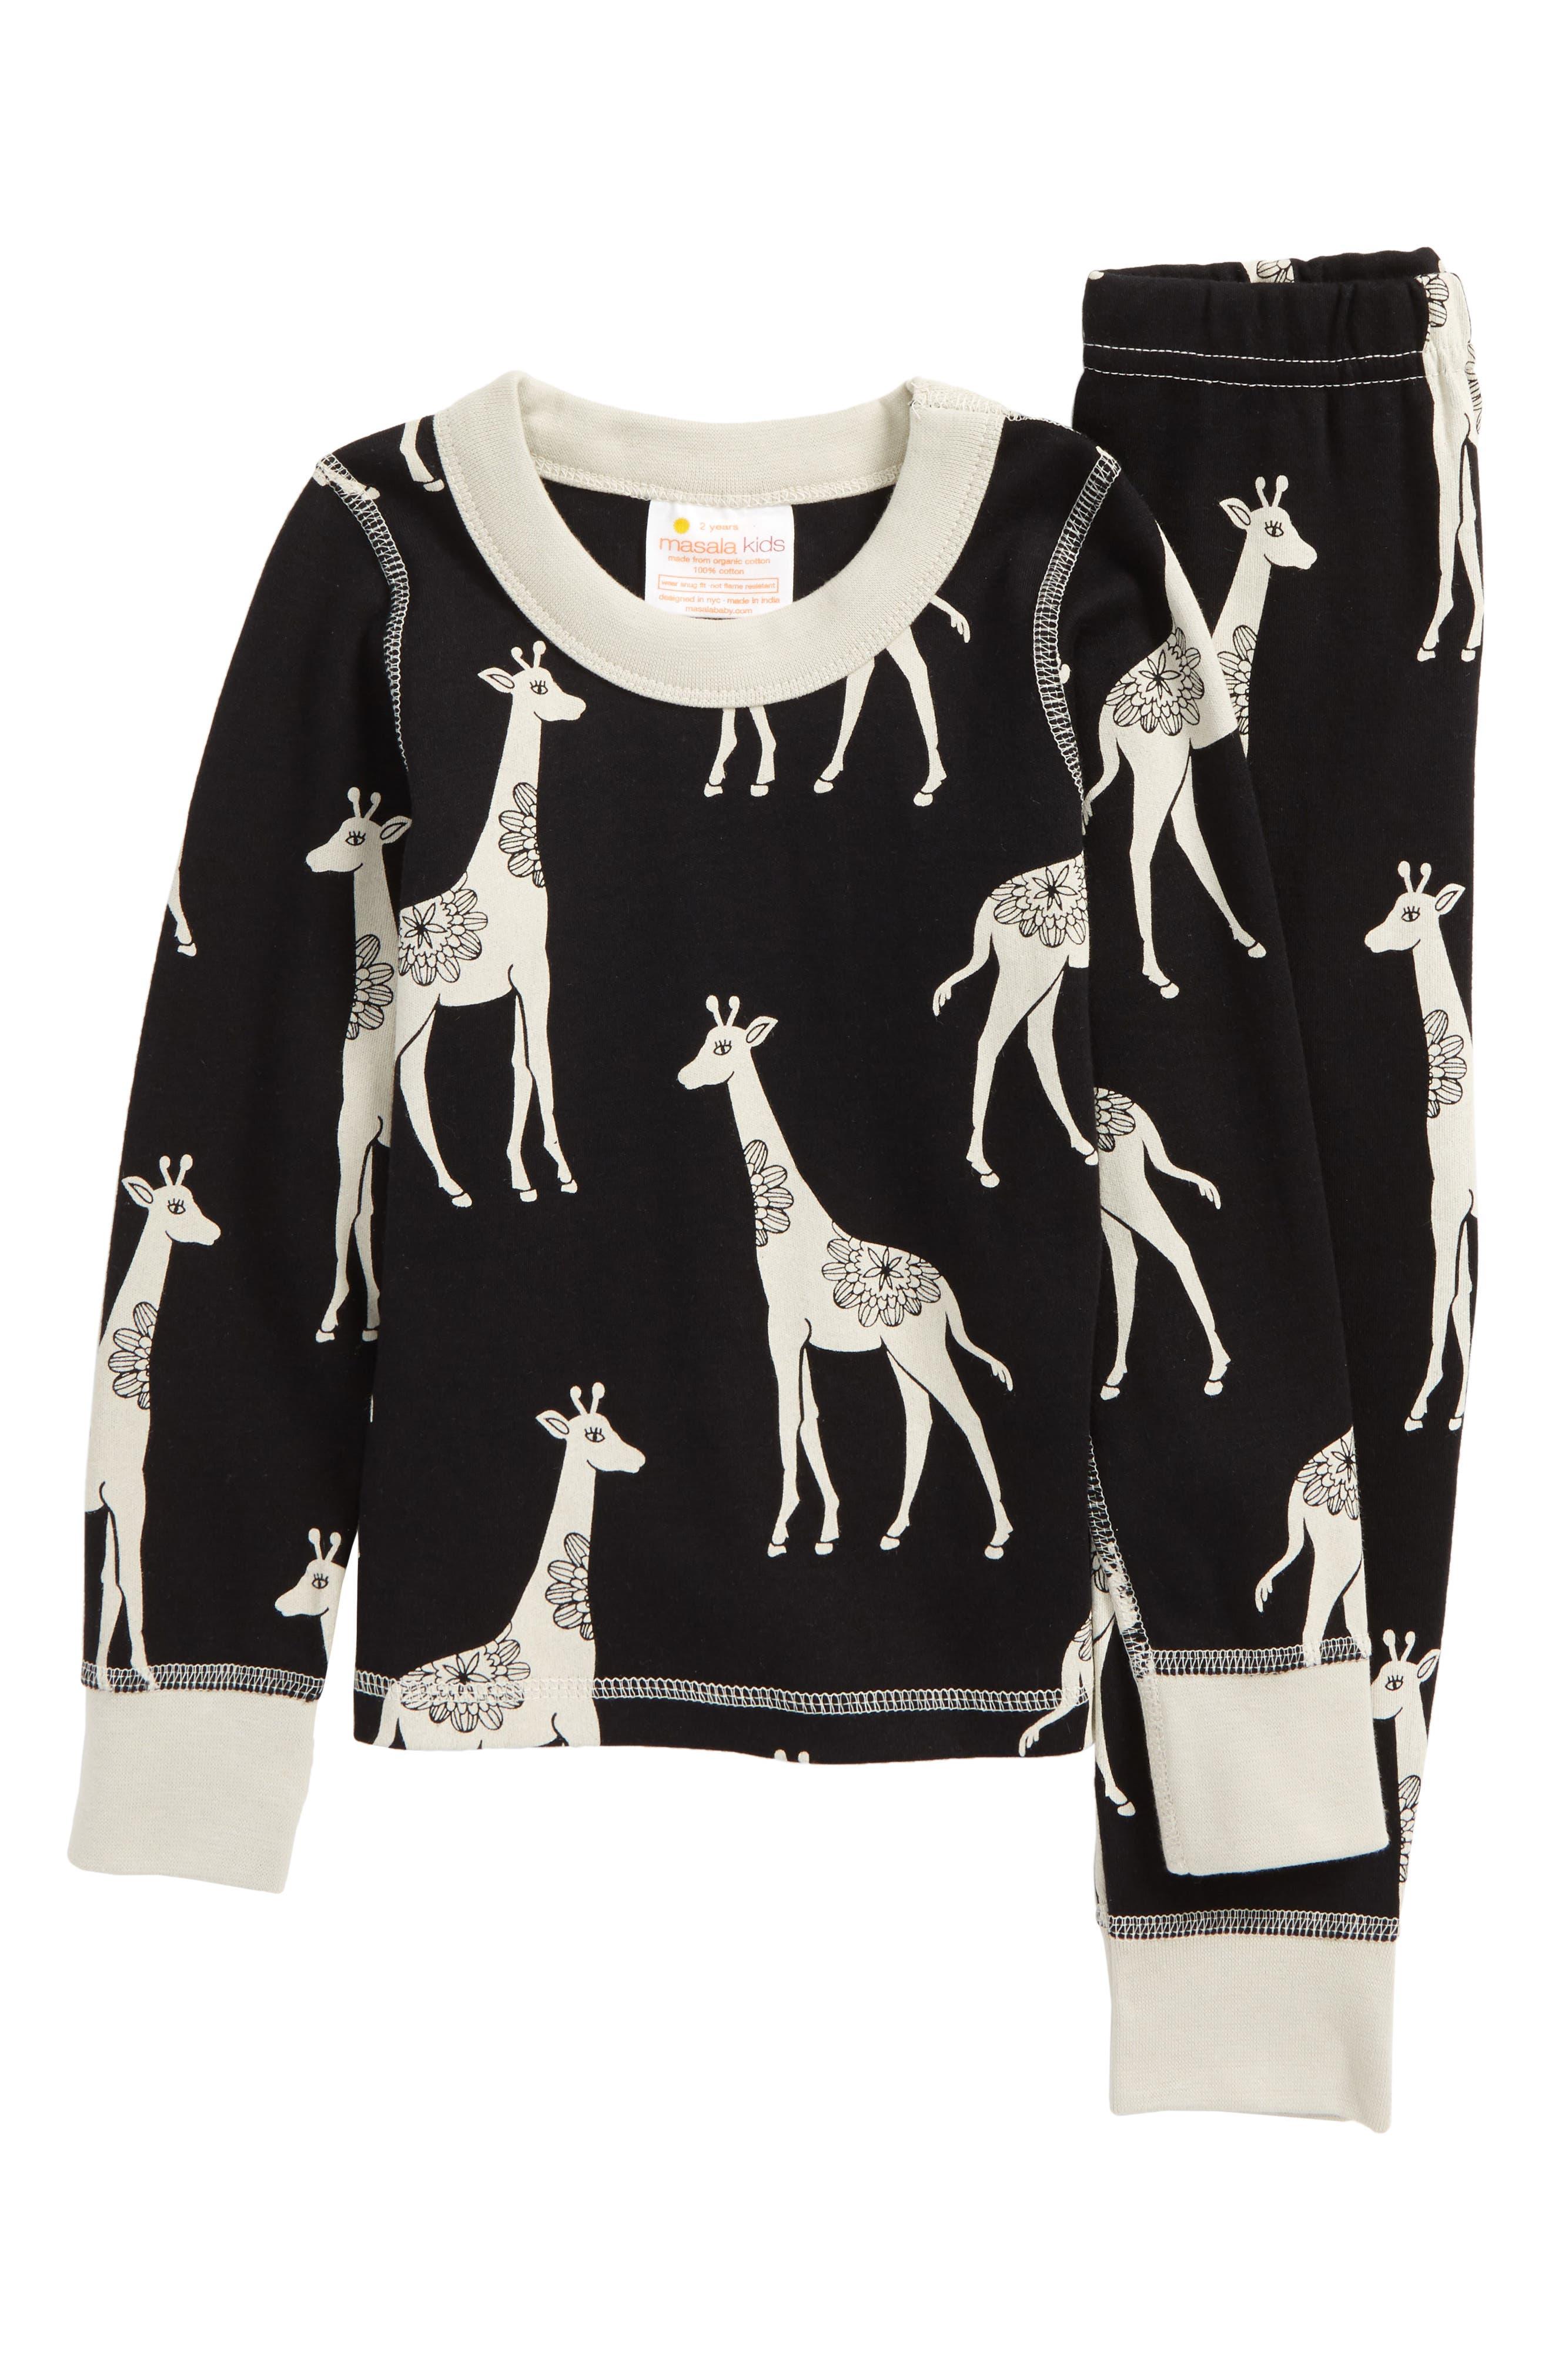 Main Image - Masalababy Giraffe Organic Cotton Fitted Two-Piece Pajamas (Toddler Kids, Little Kids & Big Kids)